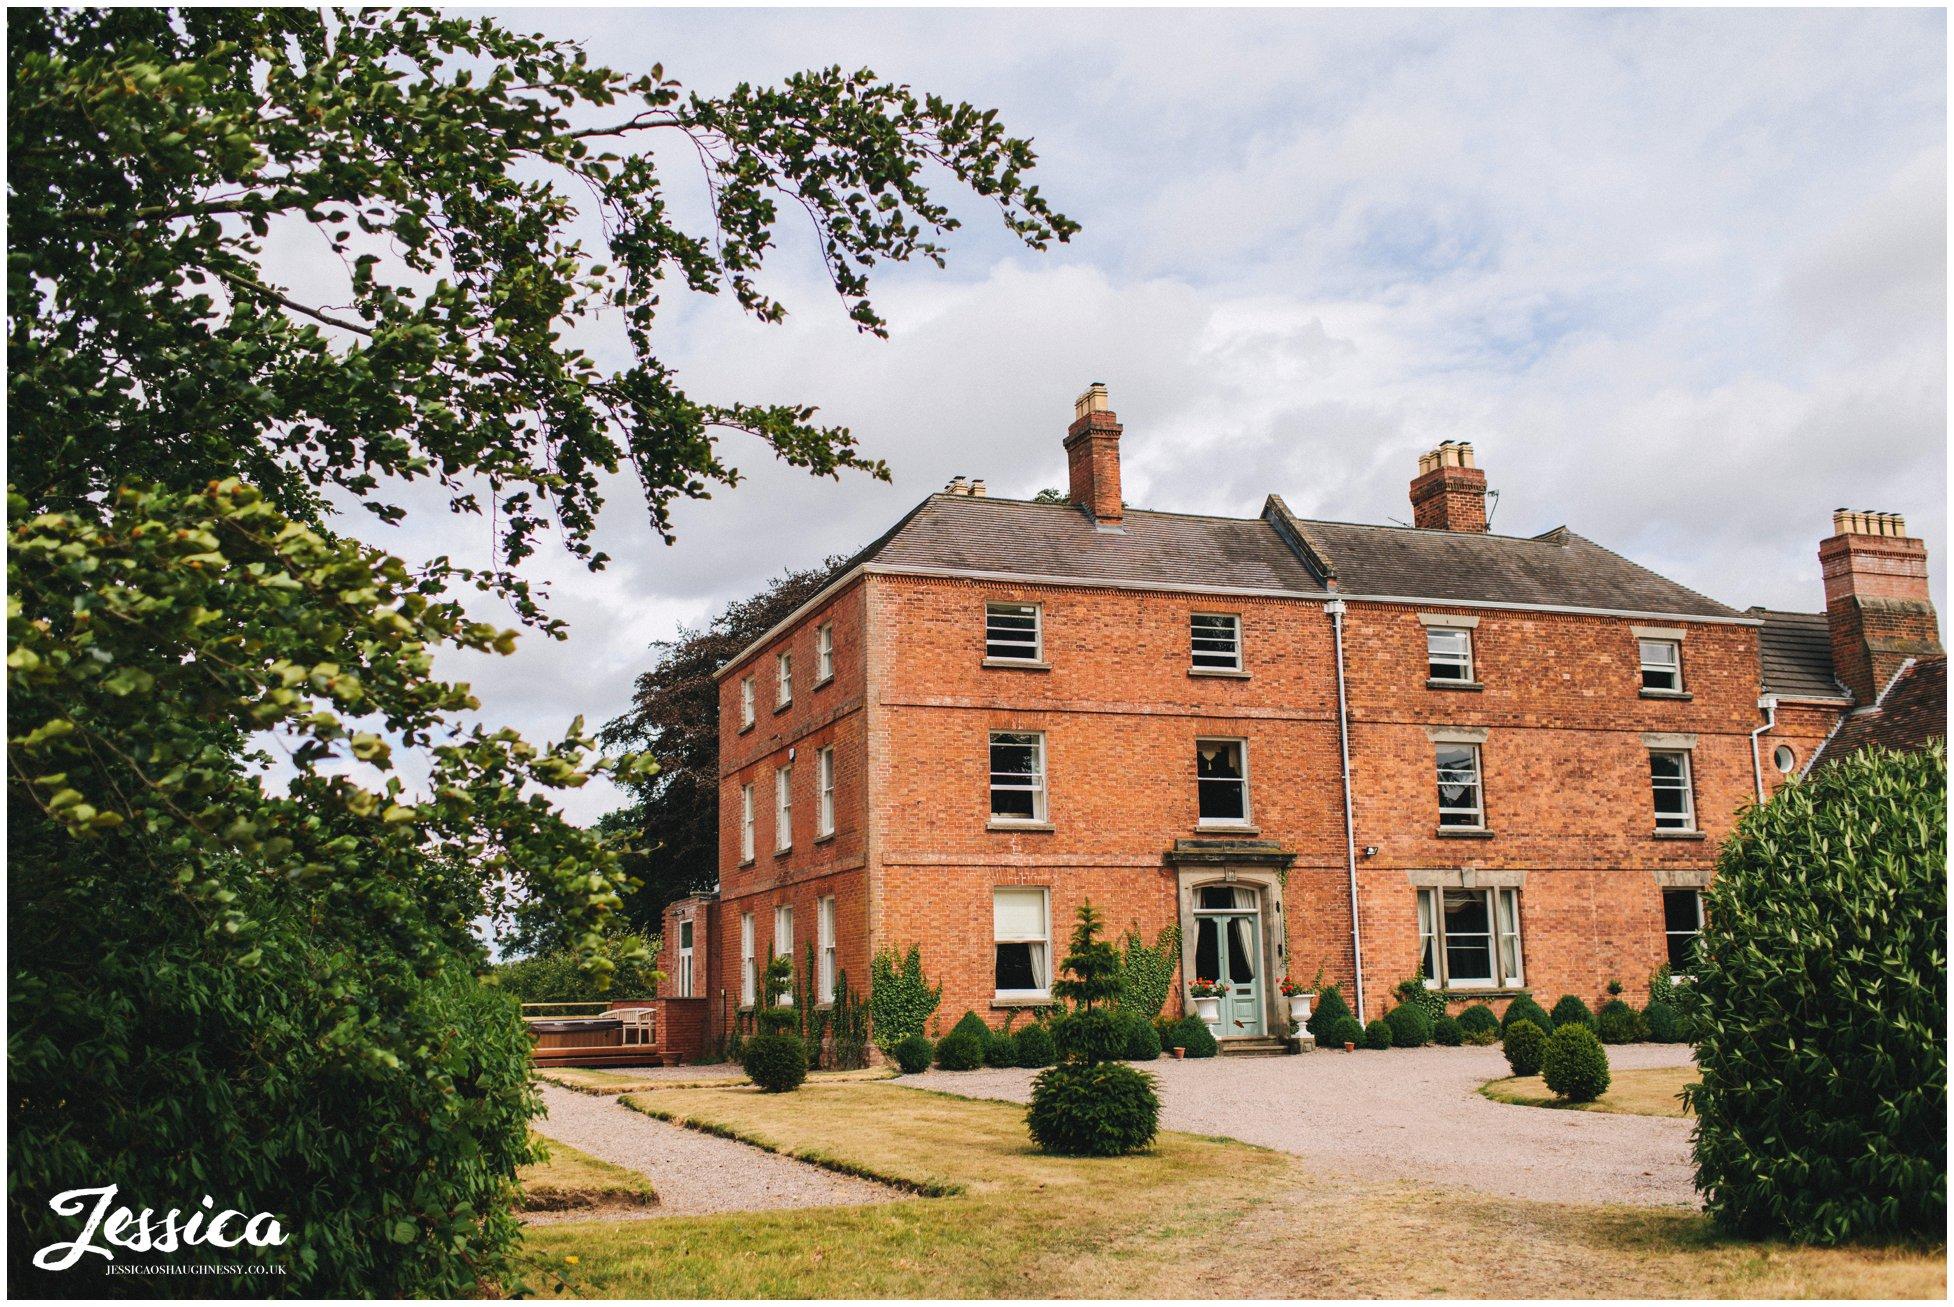 sugnall hall wedding venue in staffordshire